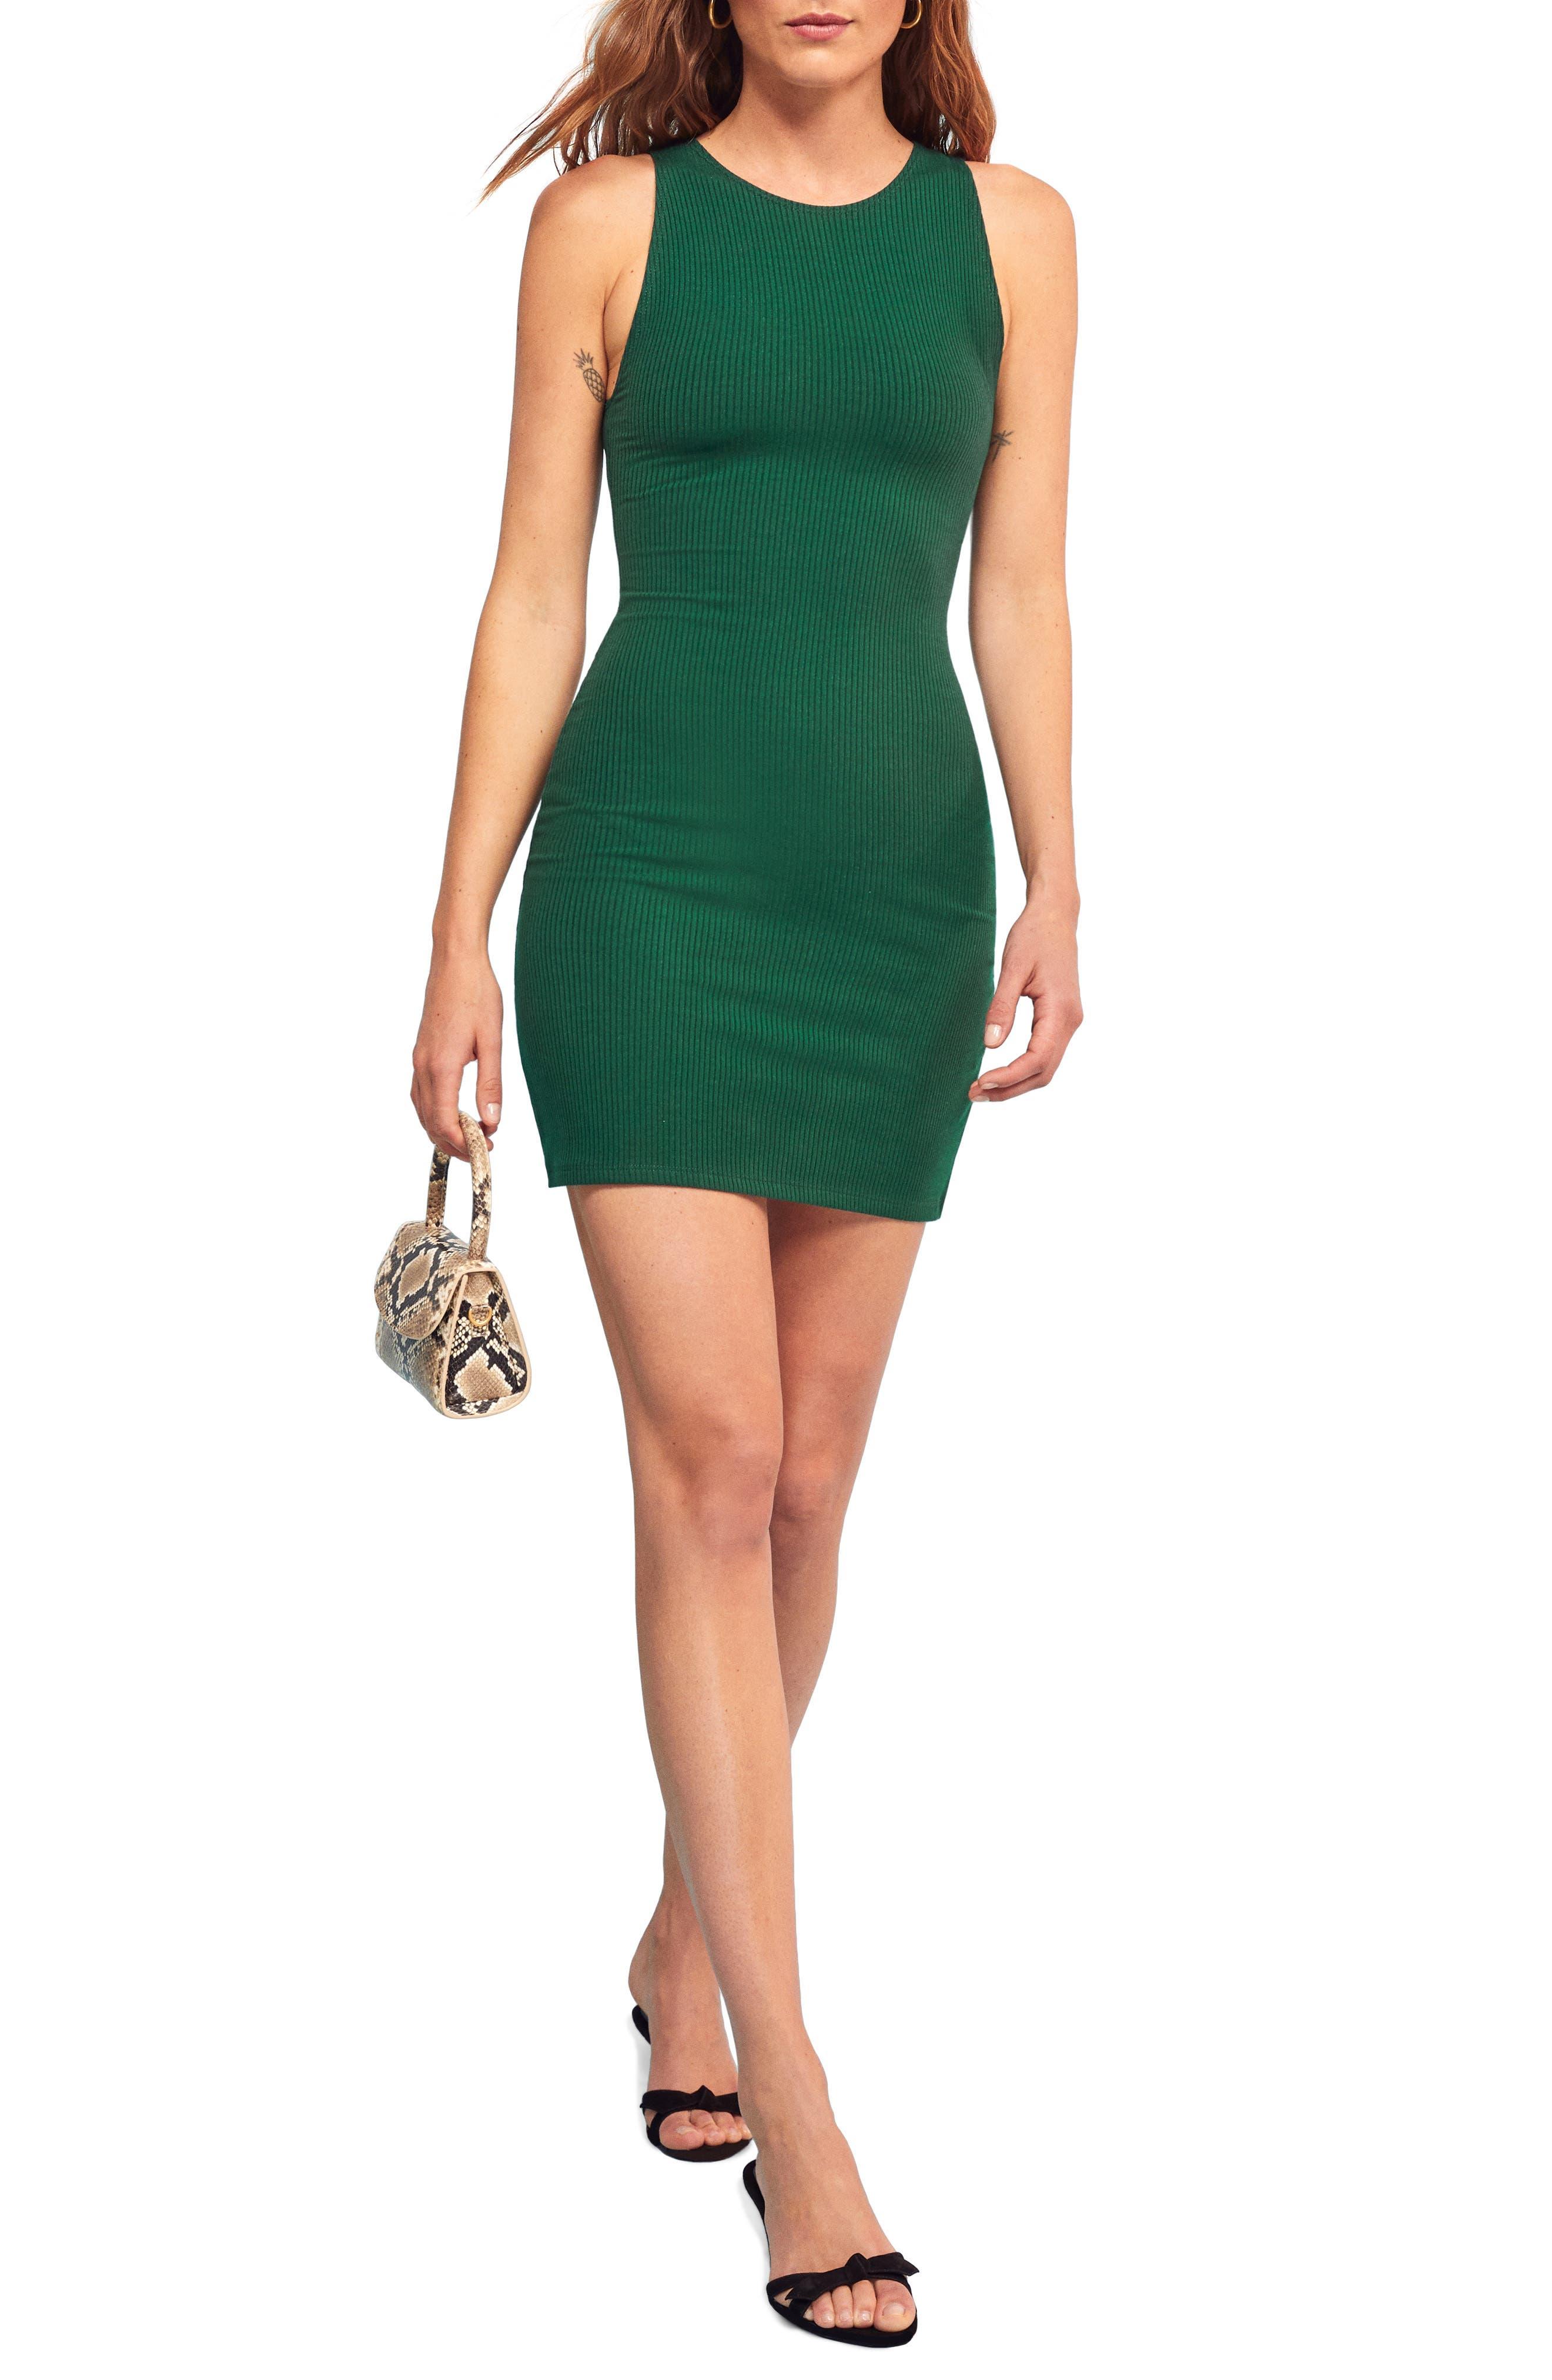 Reformation Kris Sleeveless Body-Con Dress, Green